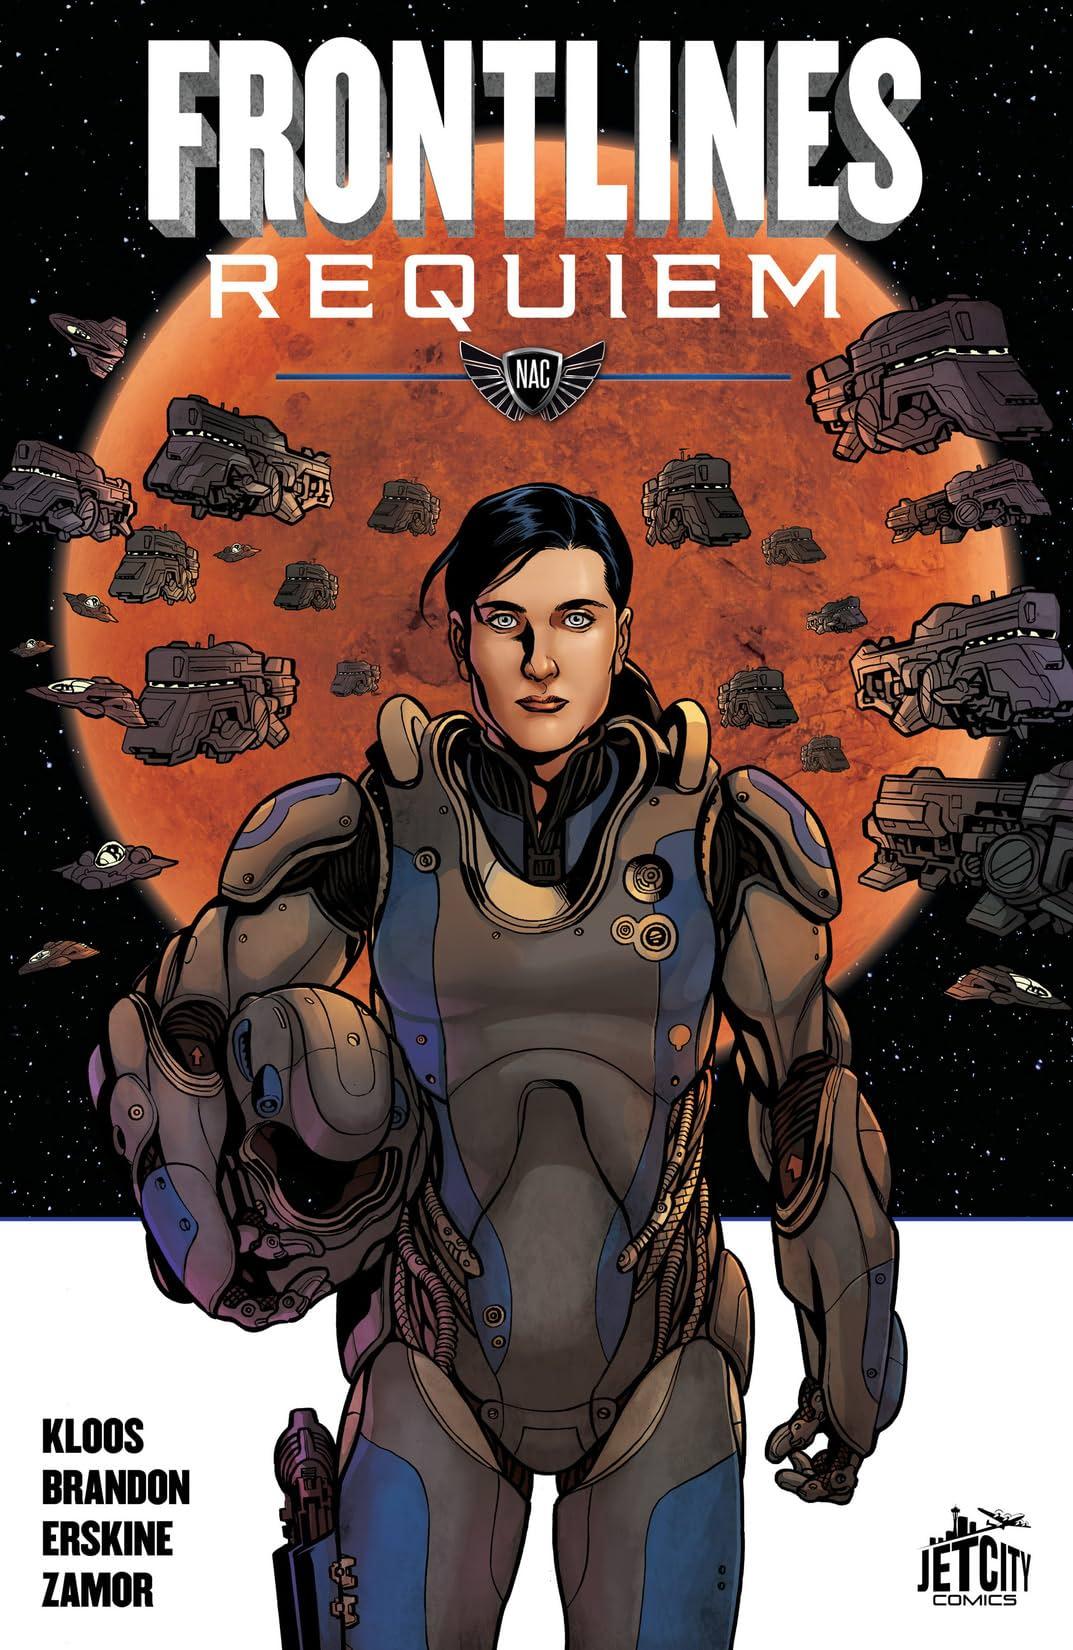 Frontlines: Requiem: The Graphic Novel